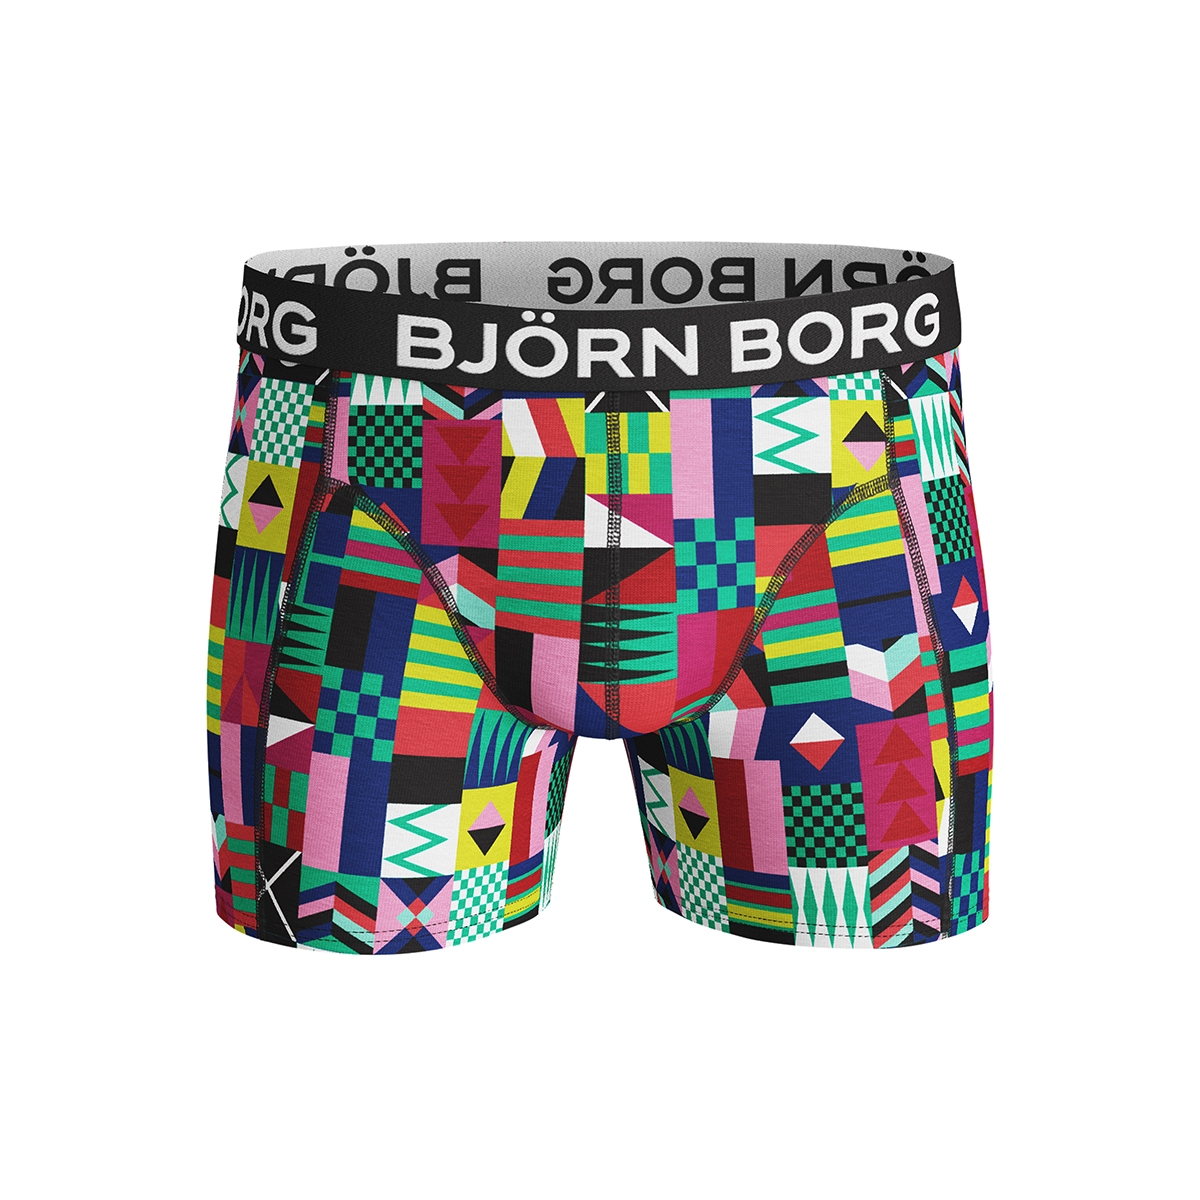 shorts sammy bb geo 2011 1156 bjorn borg ondergoed 80251 mint sleaf